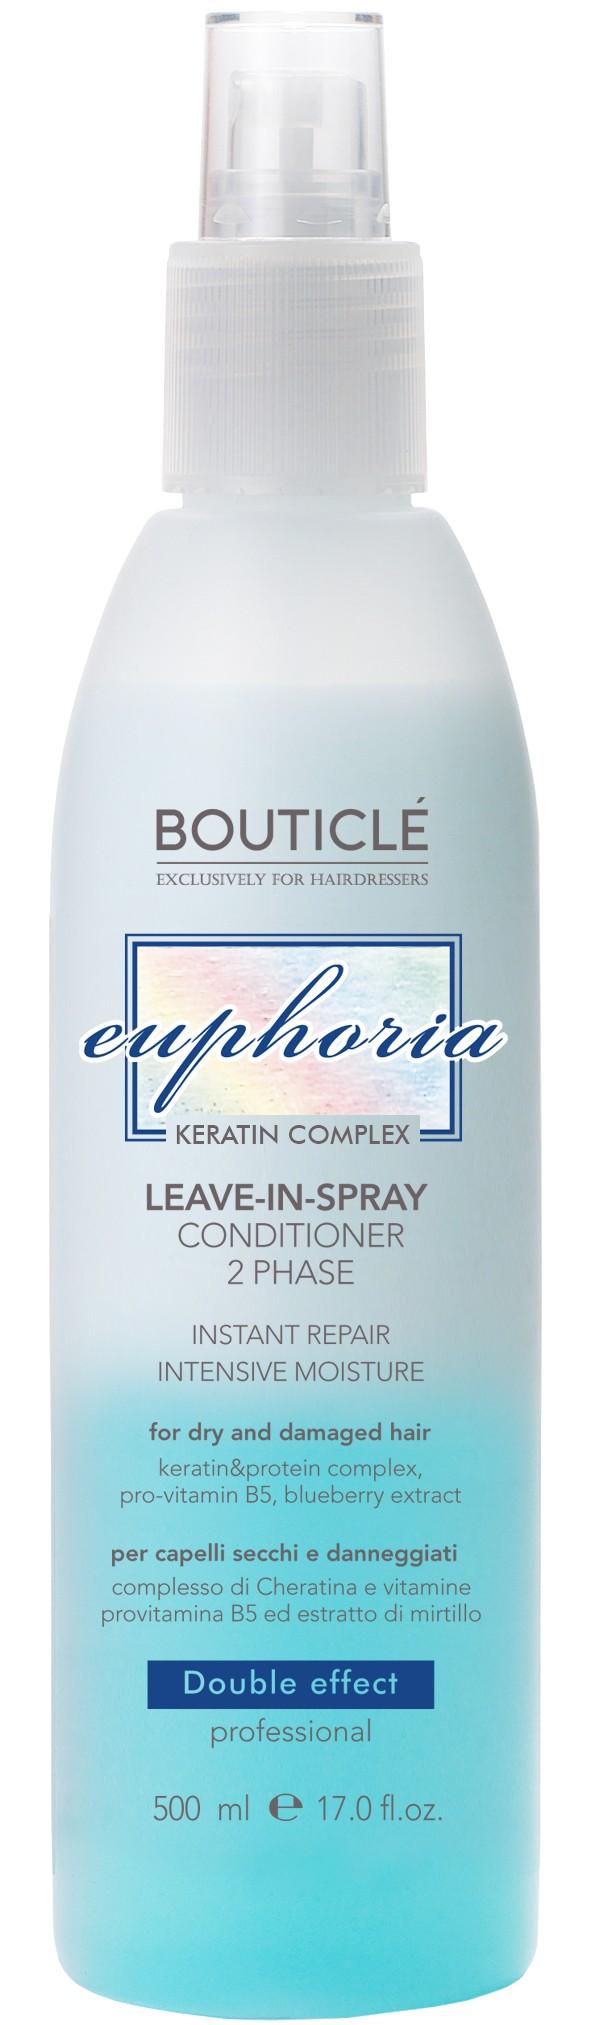 BOUTICLE Спрей-кондиционер двухфазный увлажняющий для волос / Leave-in-Spray Conditioner 2 Phase 500 мл